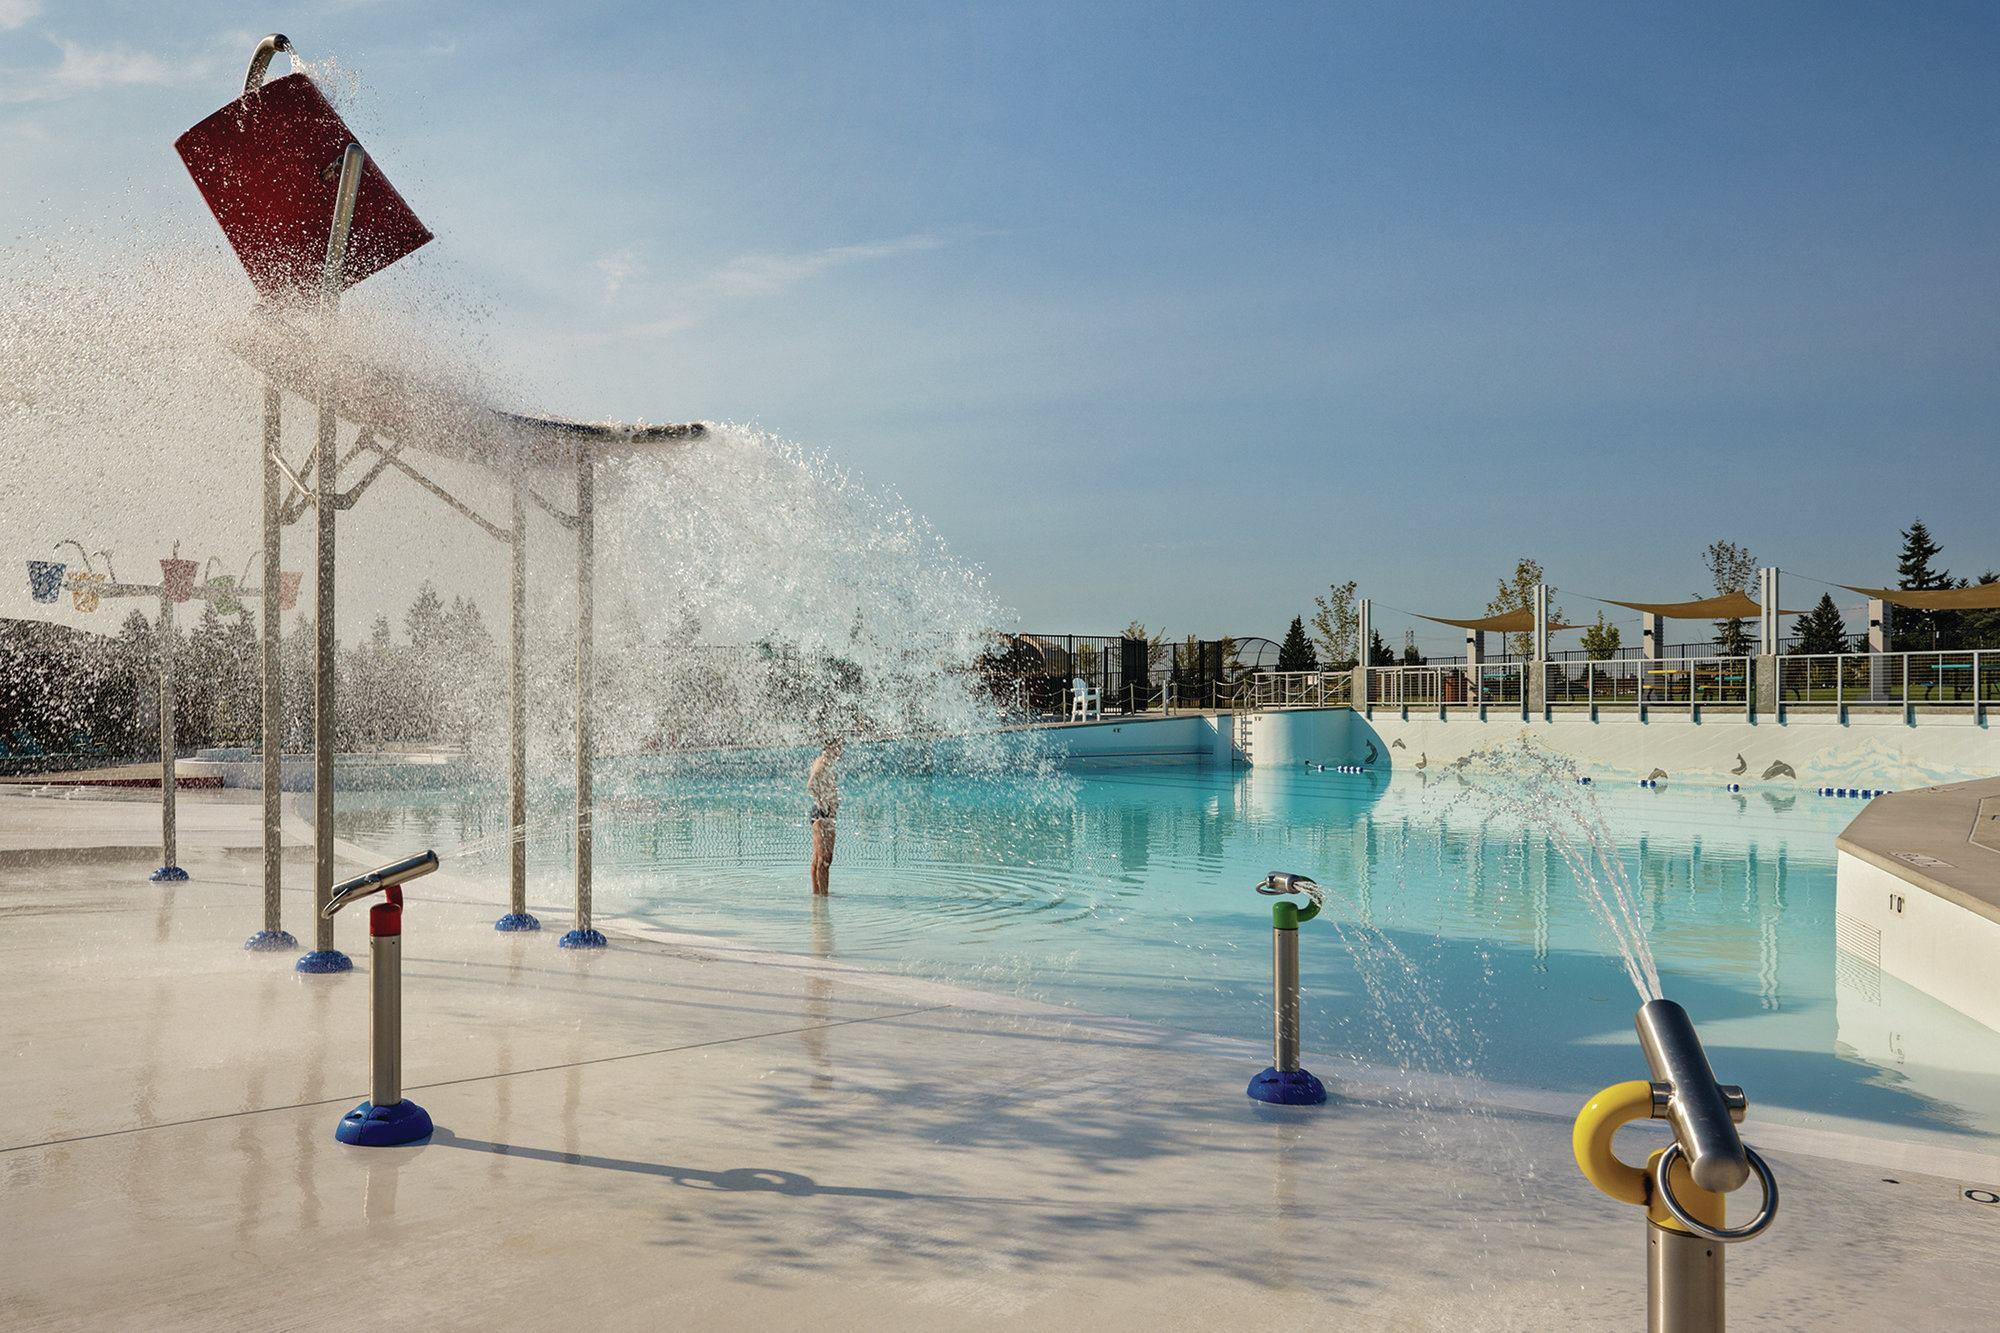 Kandle Park Amp Pool Receives Honor Aquatics International